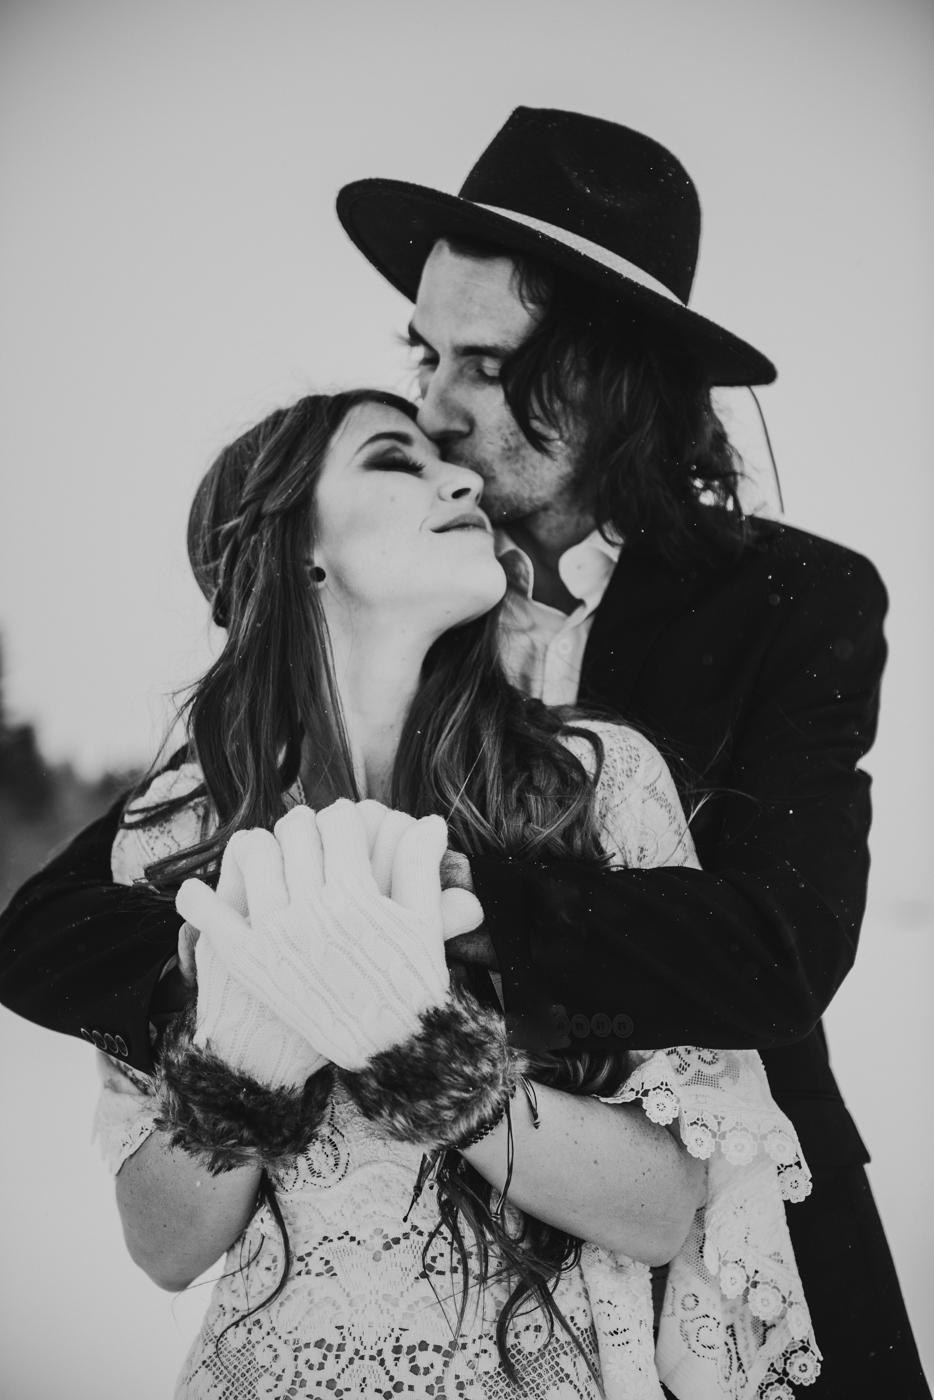 FortSt.John_photographer_TyraEPhotography_Wedding_Couple_Family_Photograhy_DawsonCreek_Elopement_Bride_Boduoir_Portraits-5051.jpg